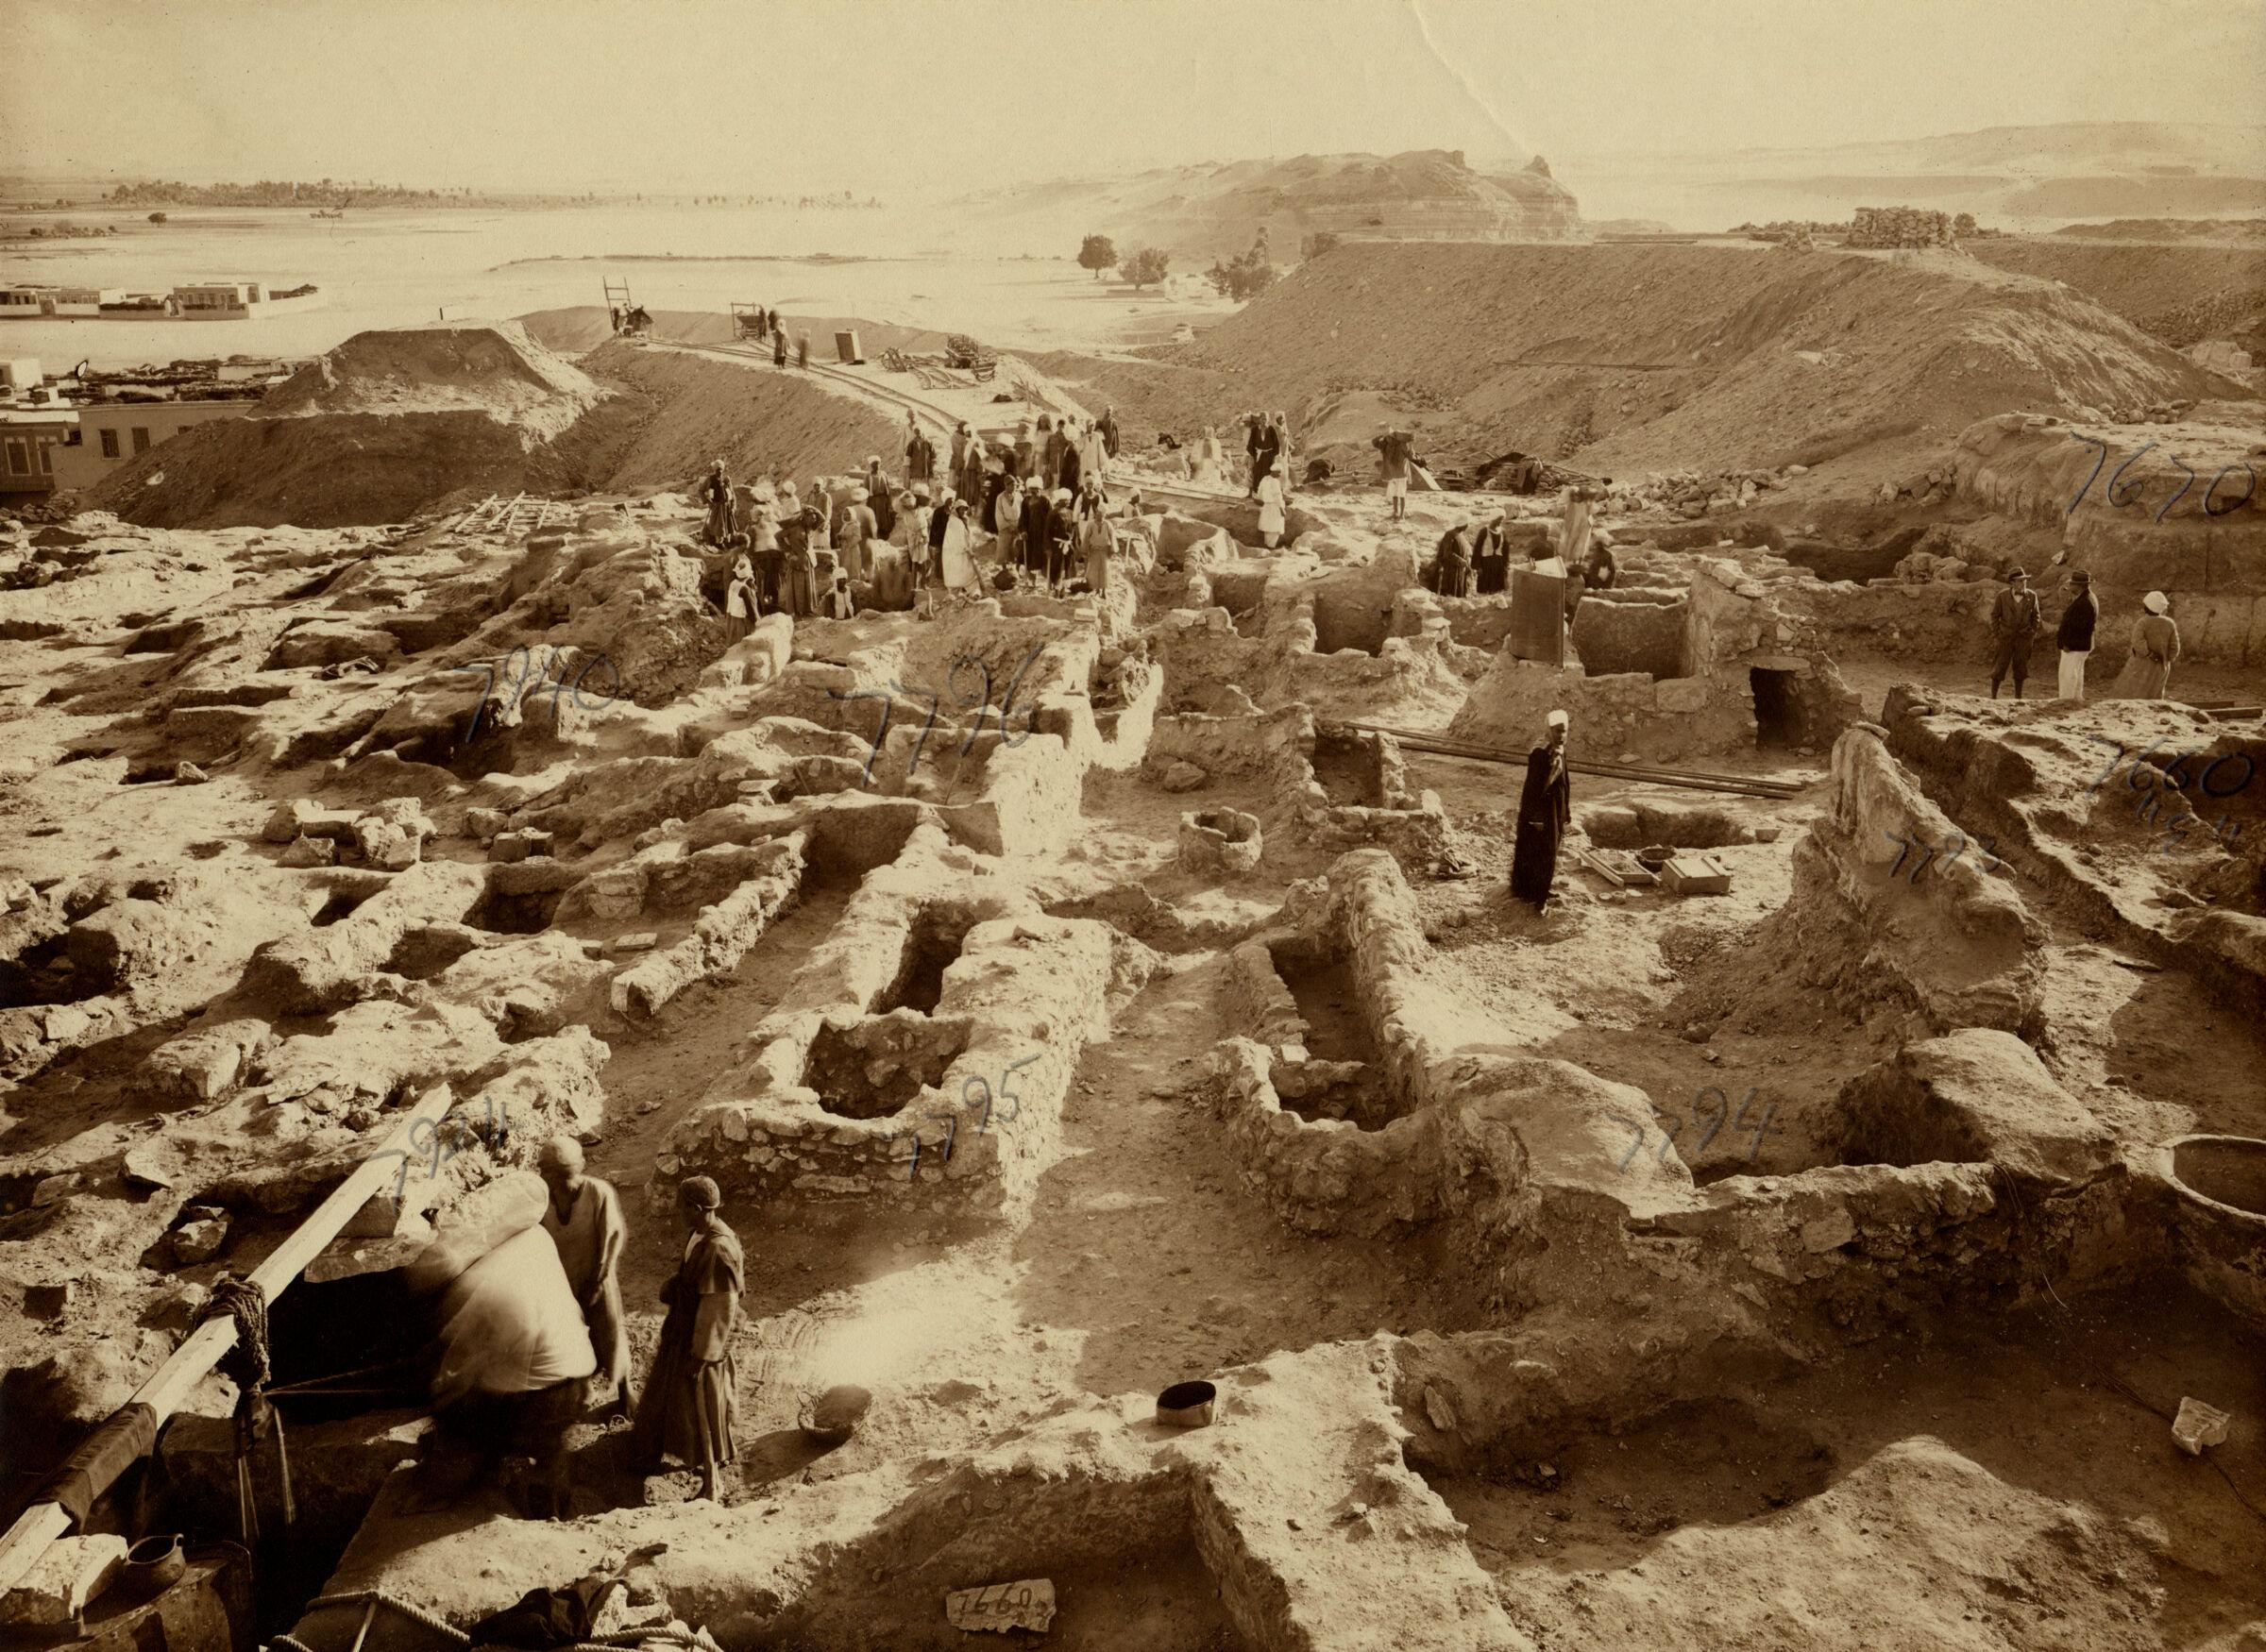 Eastern Cemetery: Site: Giza; View: G 7660, G 7794, G 7793, G 7795, G 7796, G 7924, G 7796, G 7946, G 7670